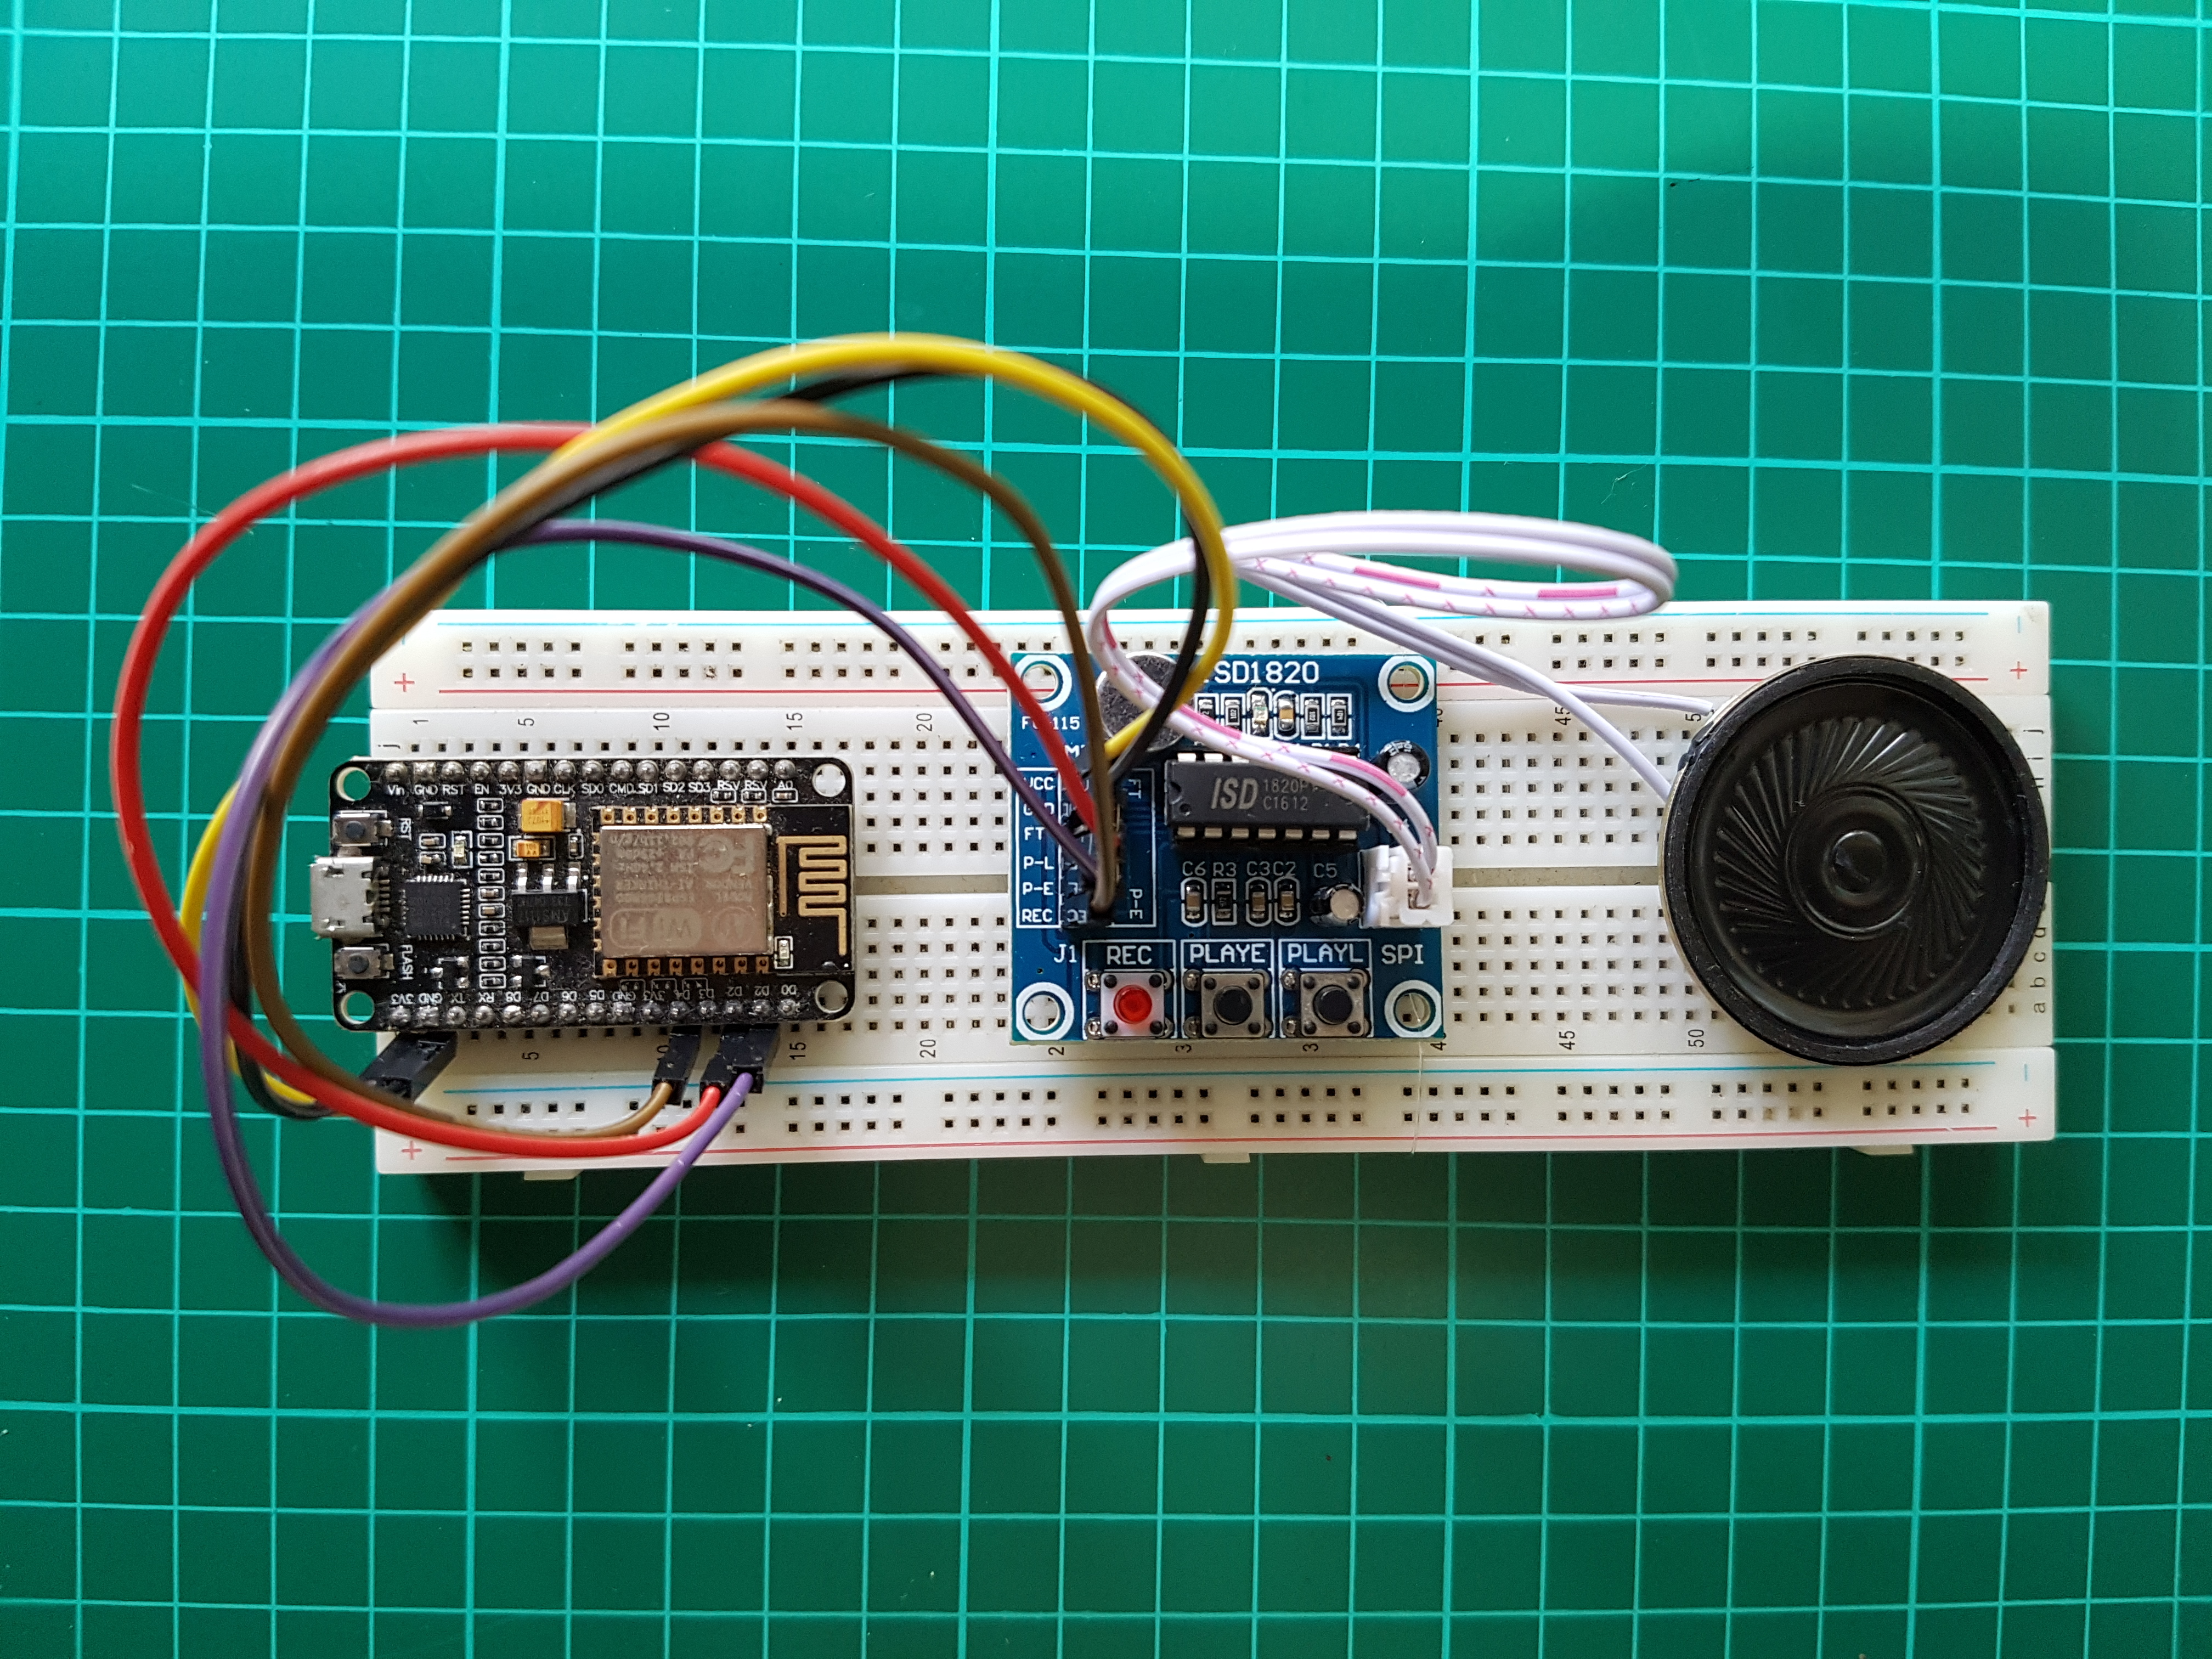 Picture of NodeMcu Speak With ISD1820 Module